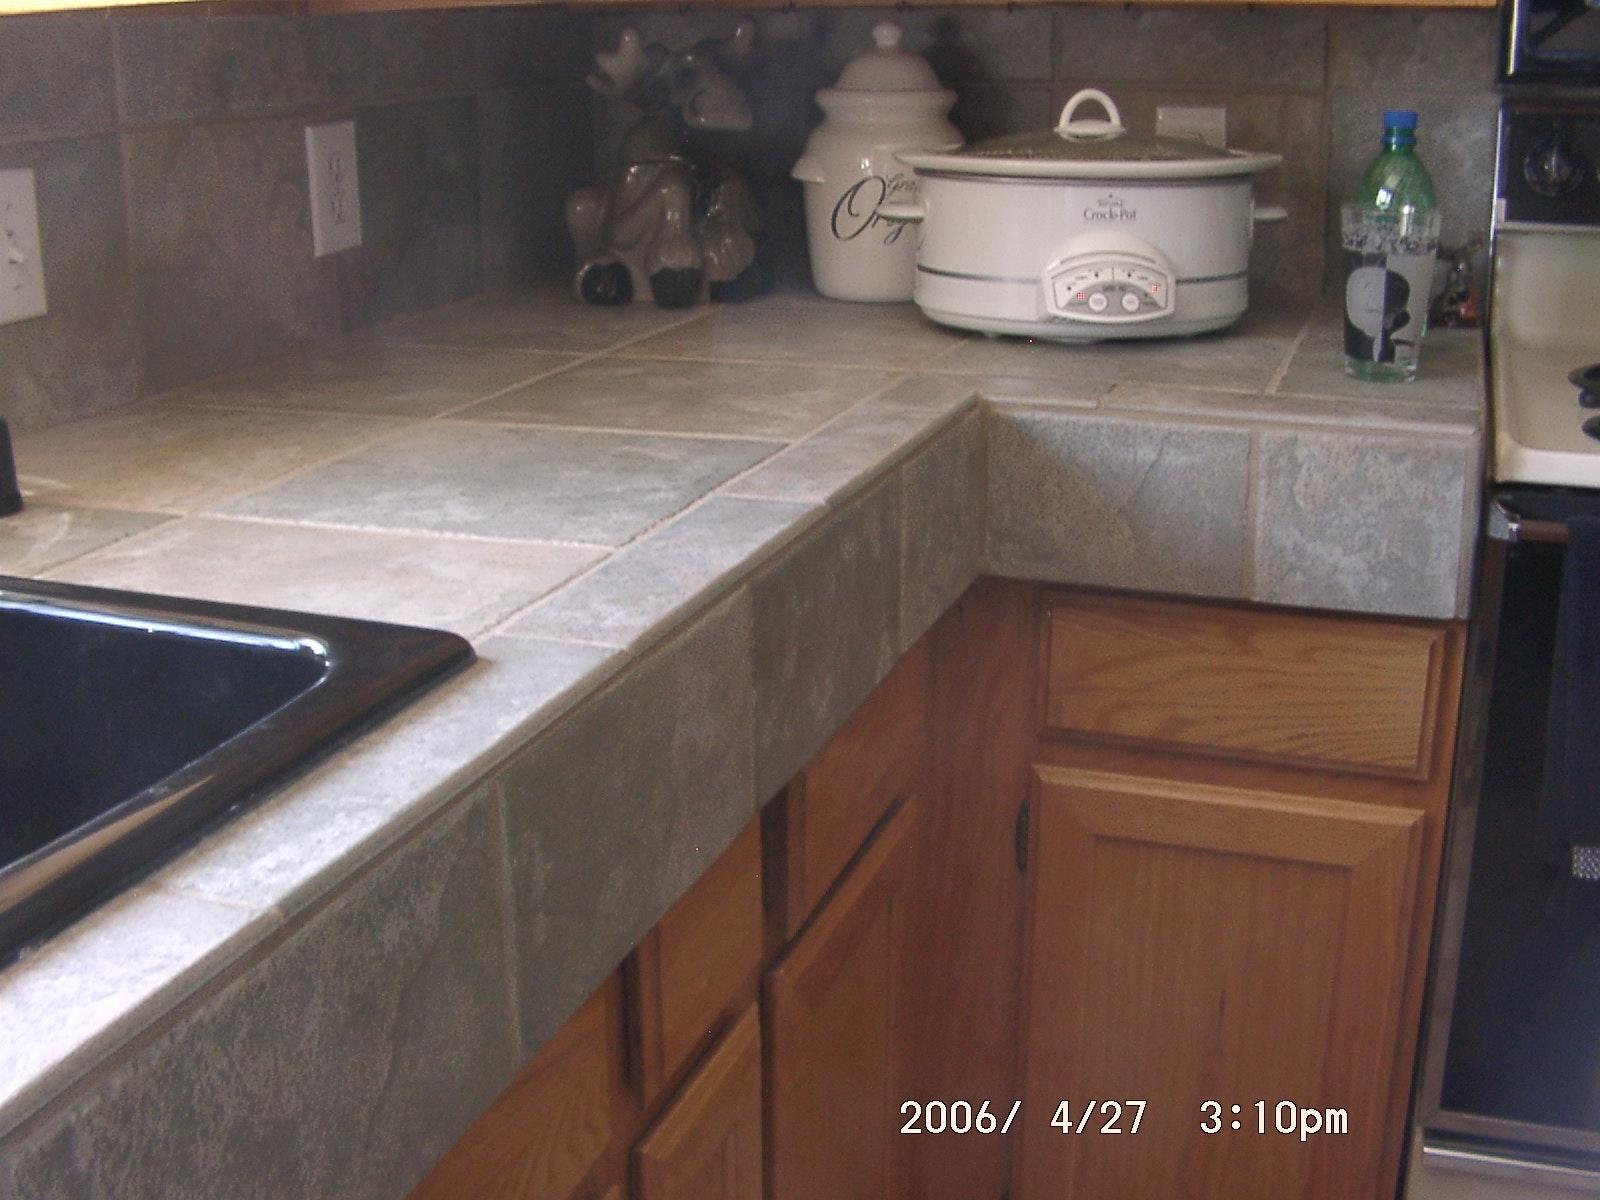 Alluring Wohnkultur Marble Tile Kitchen Countertop Tiled Countertops Home Depot Vs Granite White Calacatta Gold Piedra De Andalus